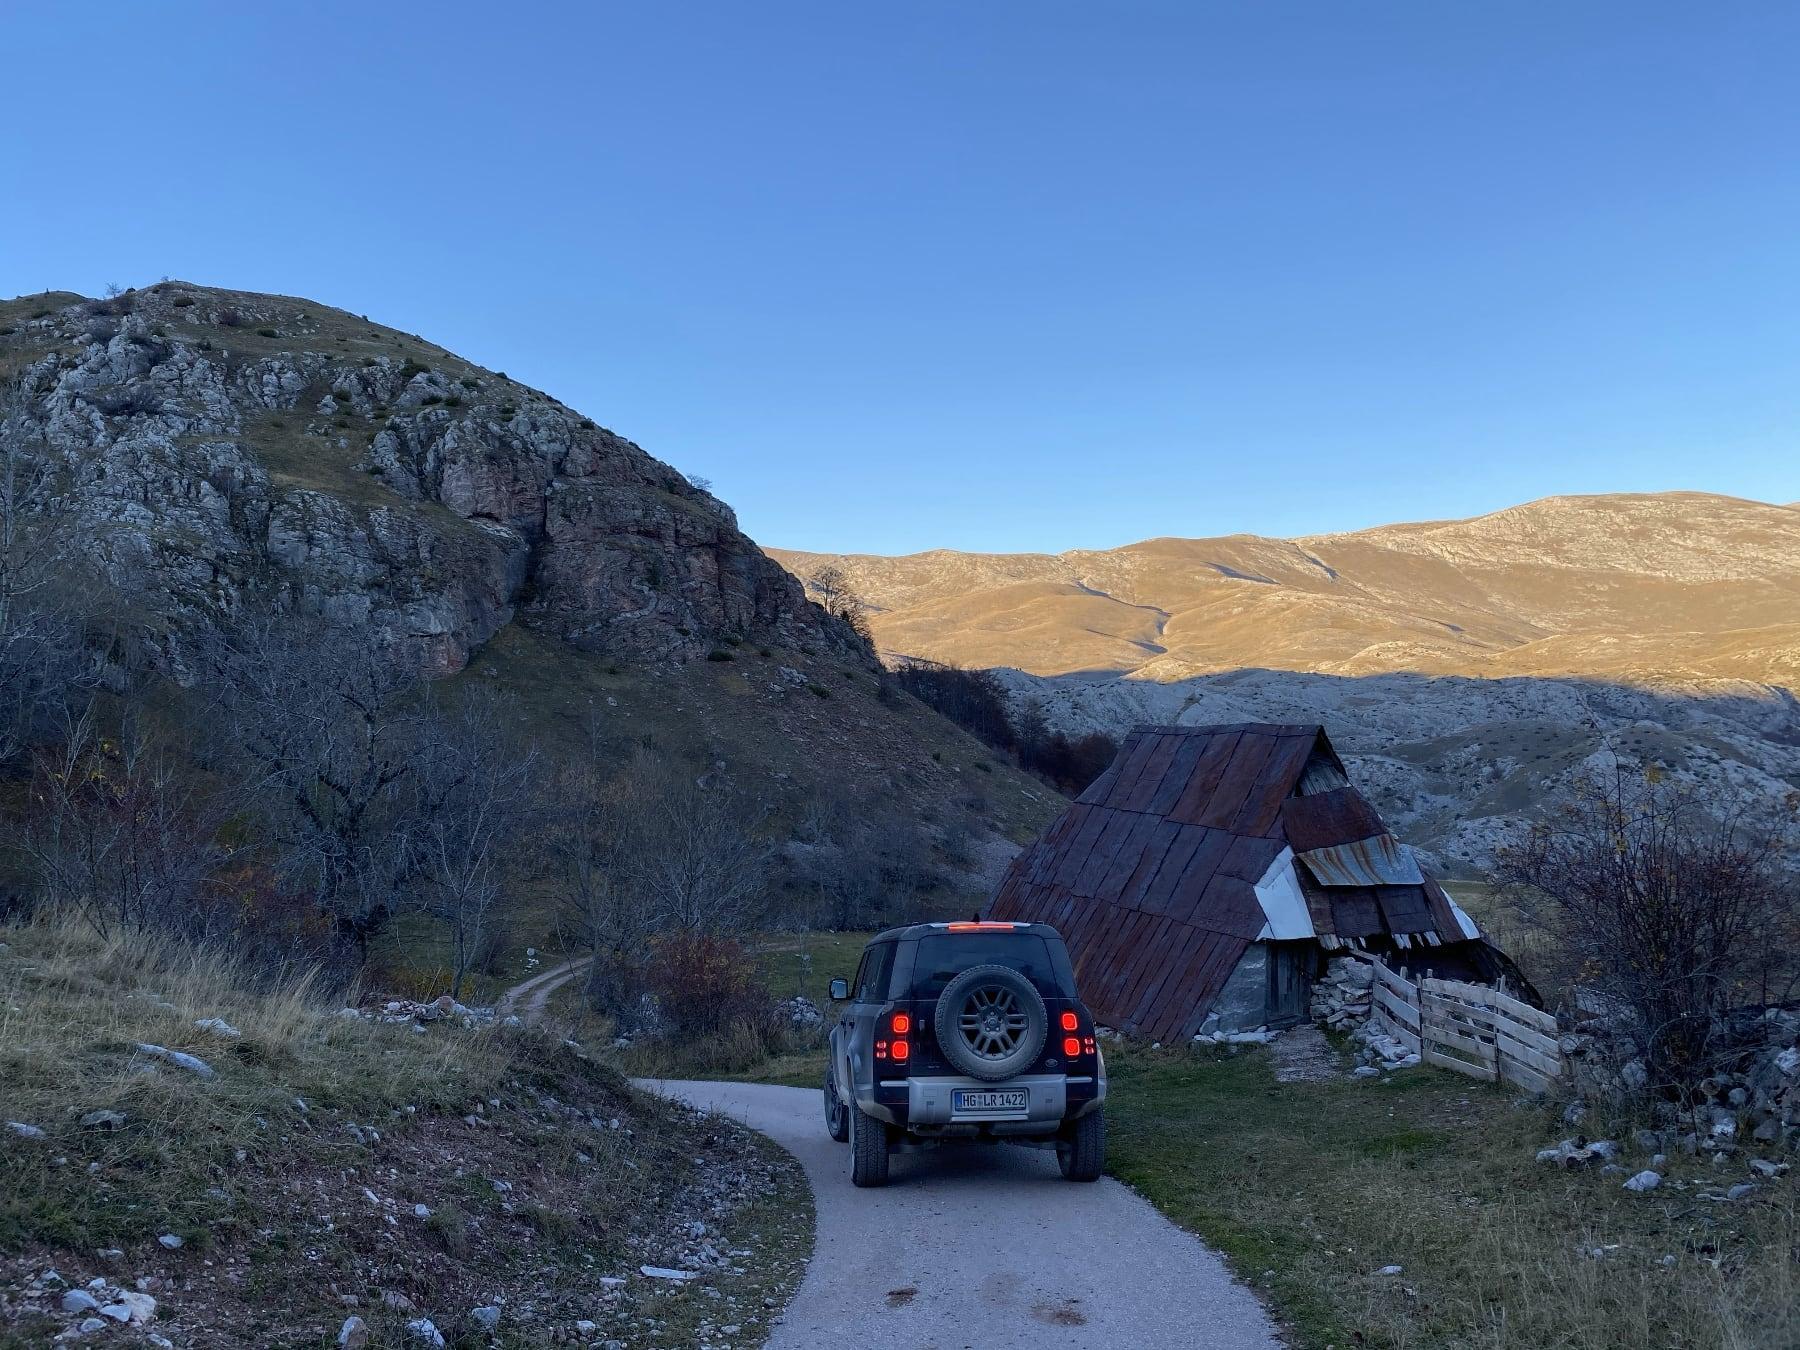 Mountain Village Umoljani - In Search of the Stone Dragon 7